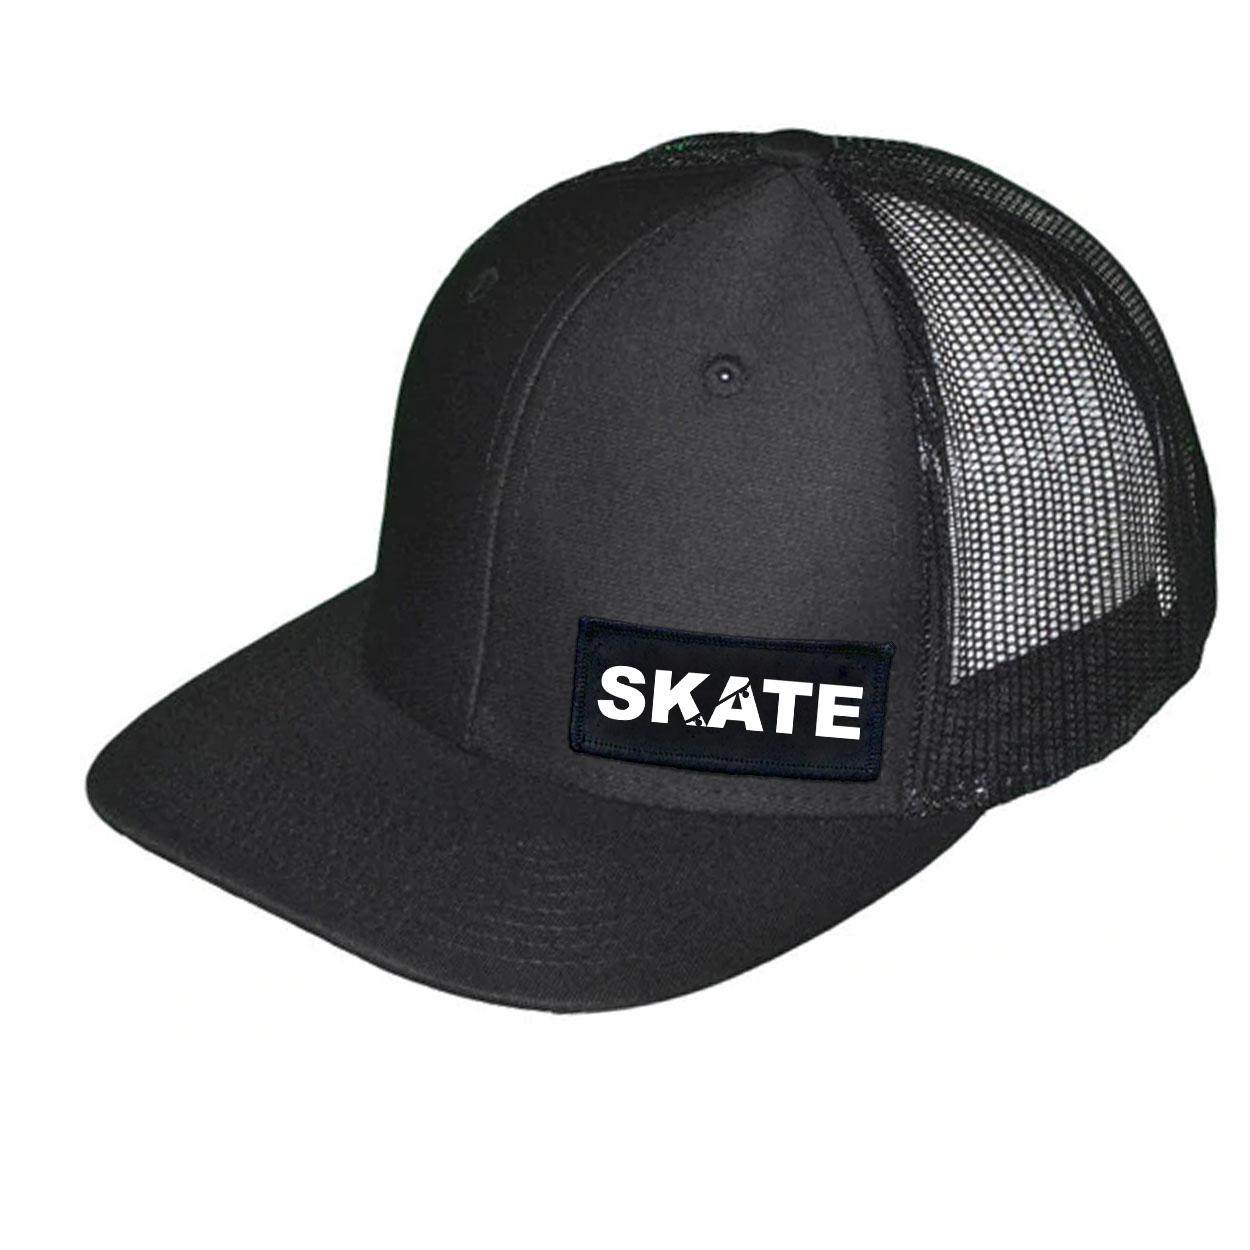 Skate Ollie Skateboard Logo Night Out Woven Patch Snapback Trucker Hat Black (White Logo)